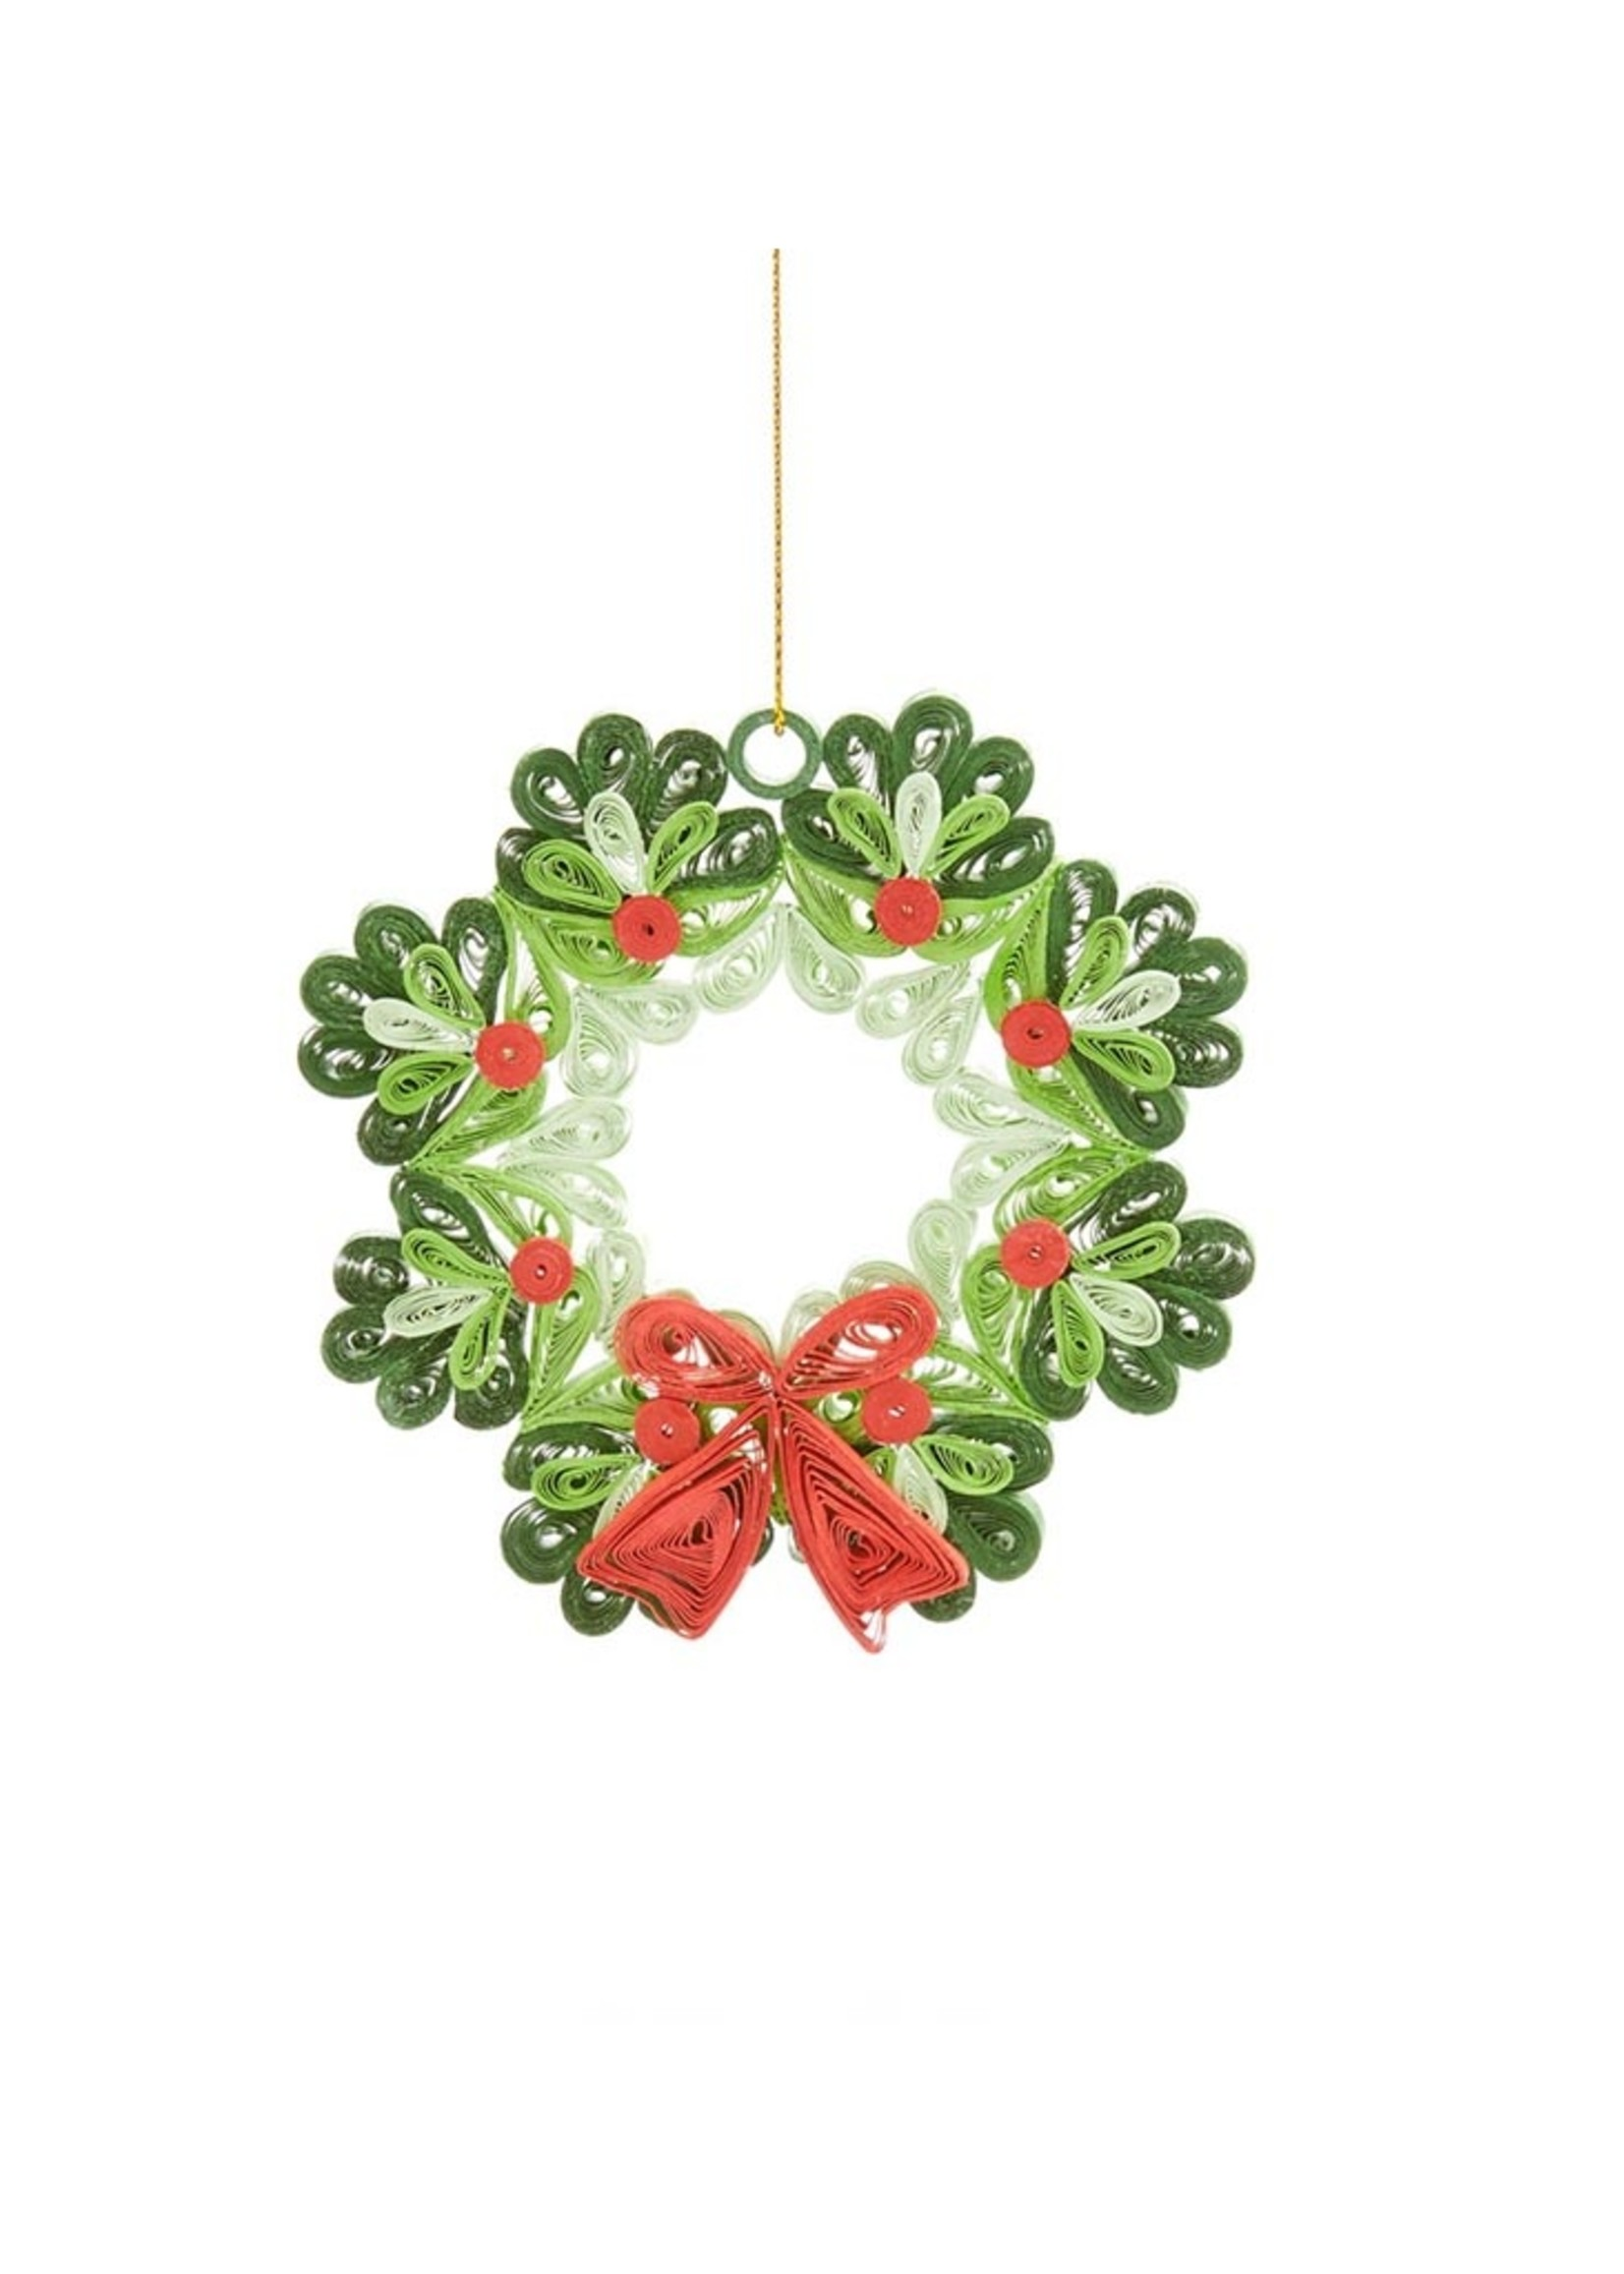 Mai Vietnamese Handicrafts Quilled Wreath Ornament